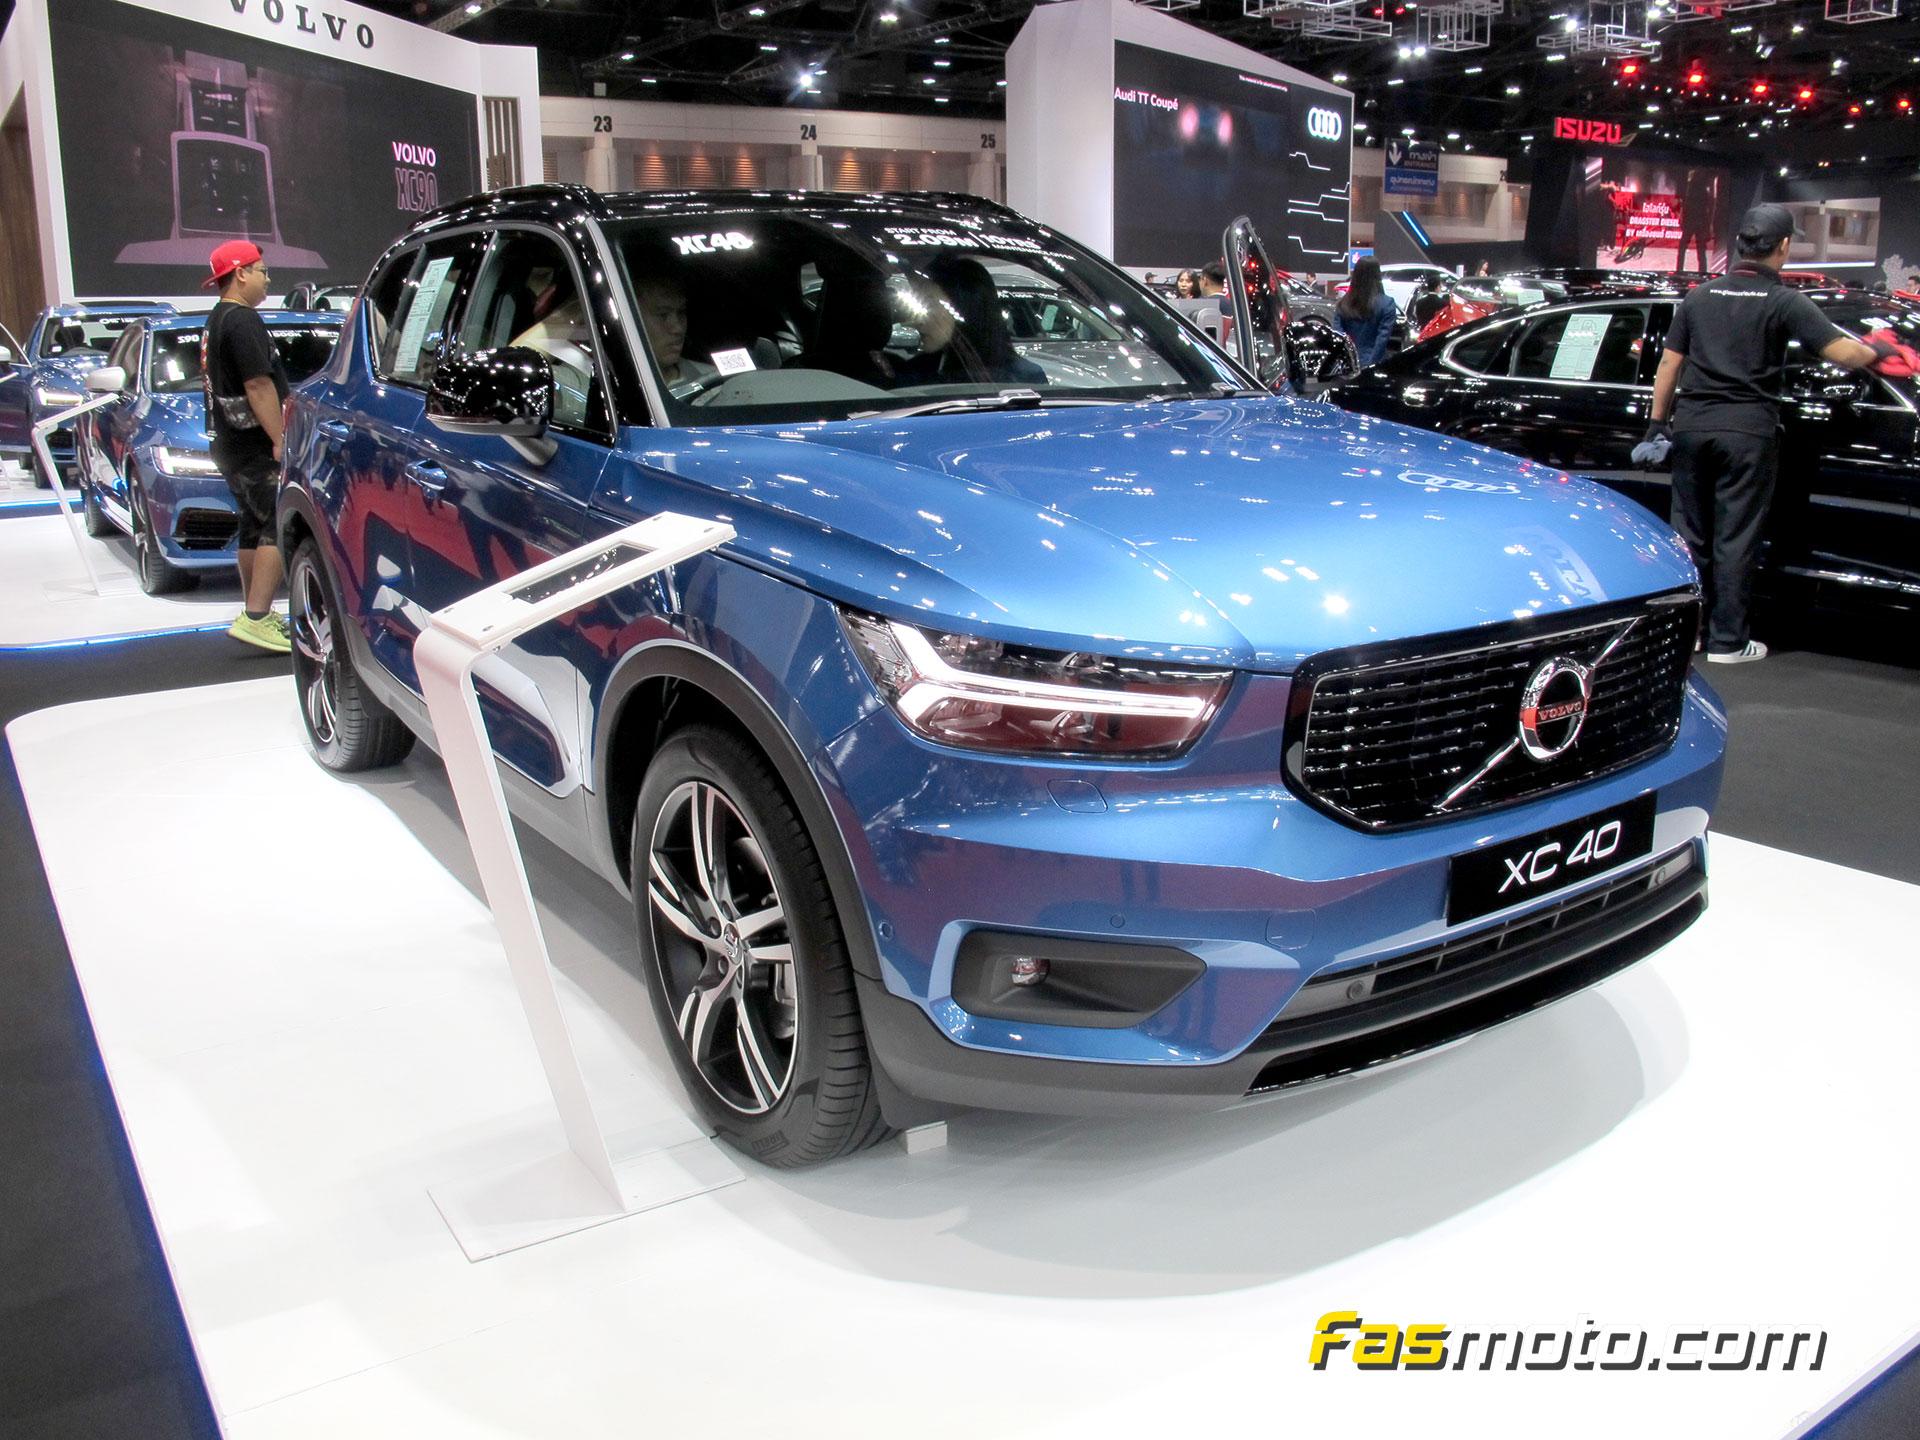 Blue Volvo XC40 Front three quarter